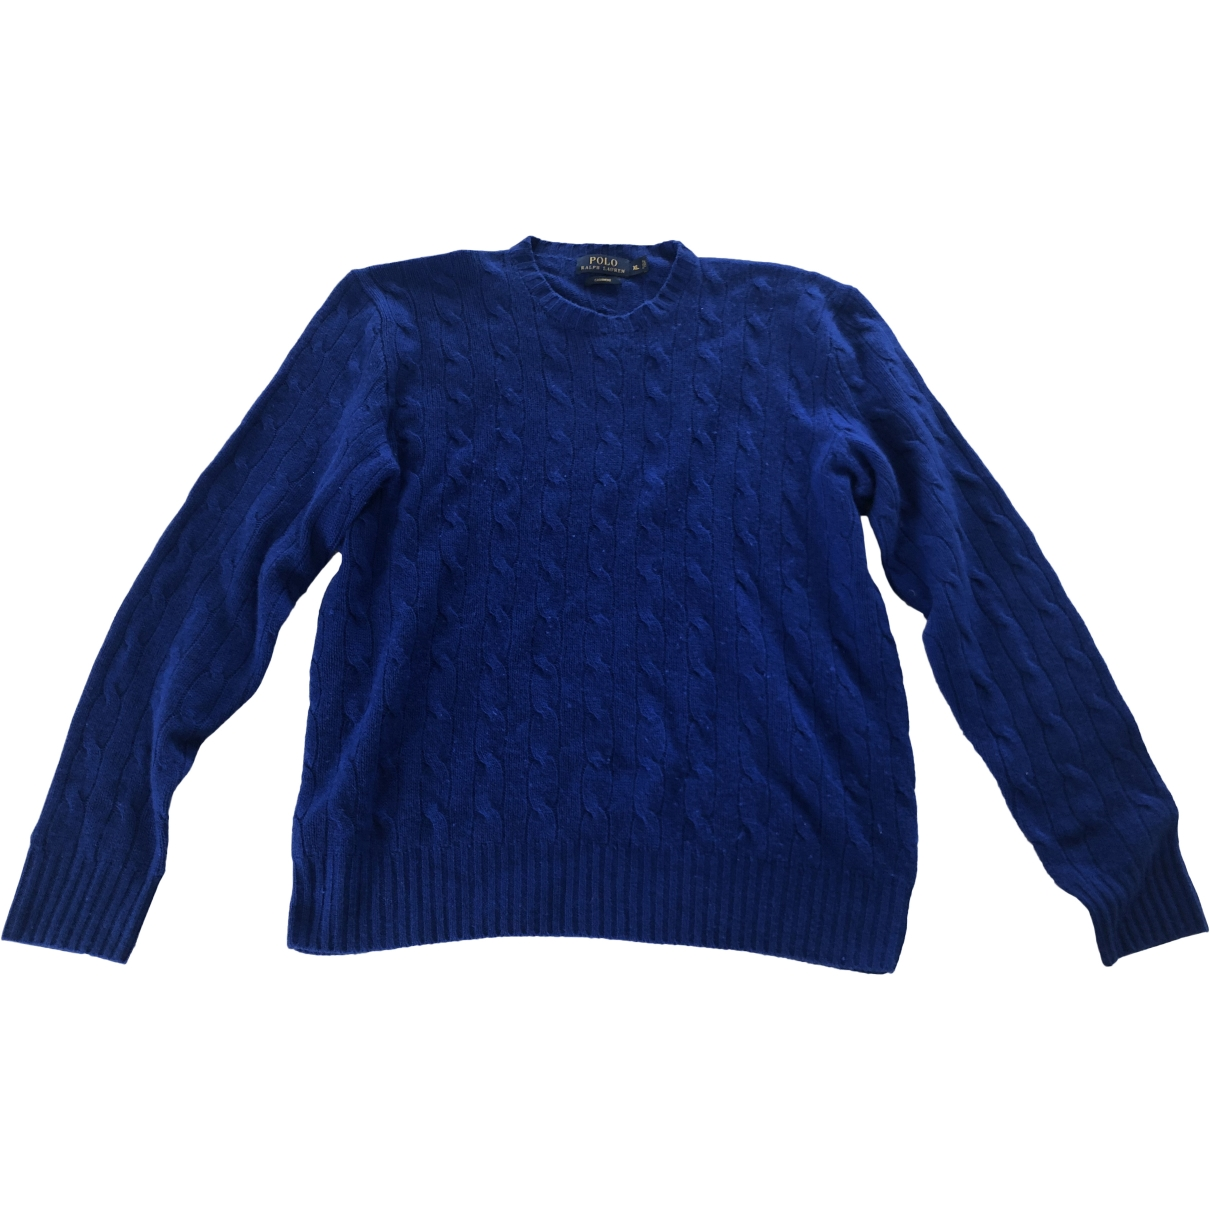 Polo Ralph Lauren \N Blue Cashmere Knitwear & Sweatshirts for Men XL International